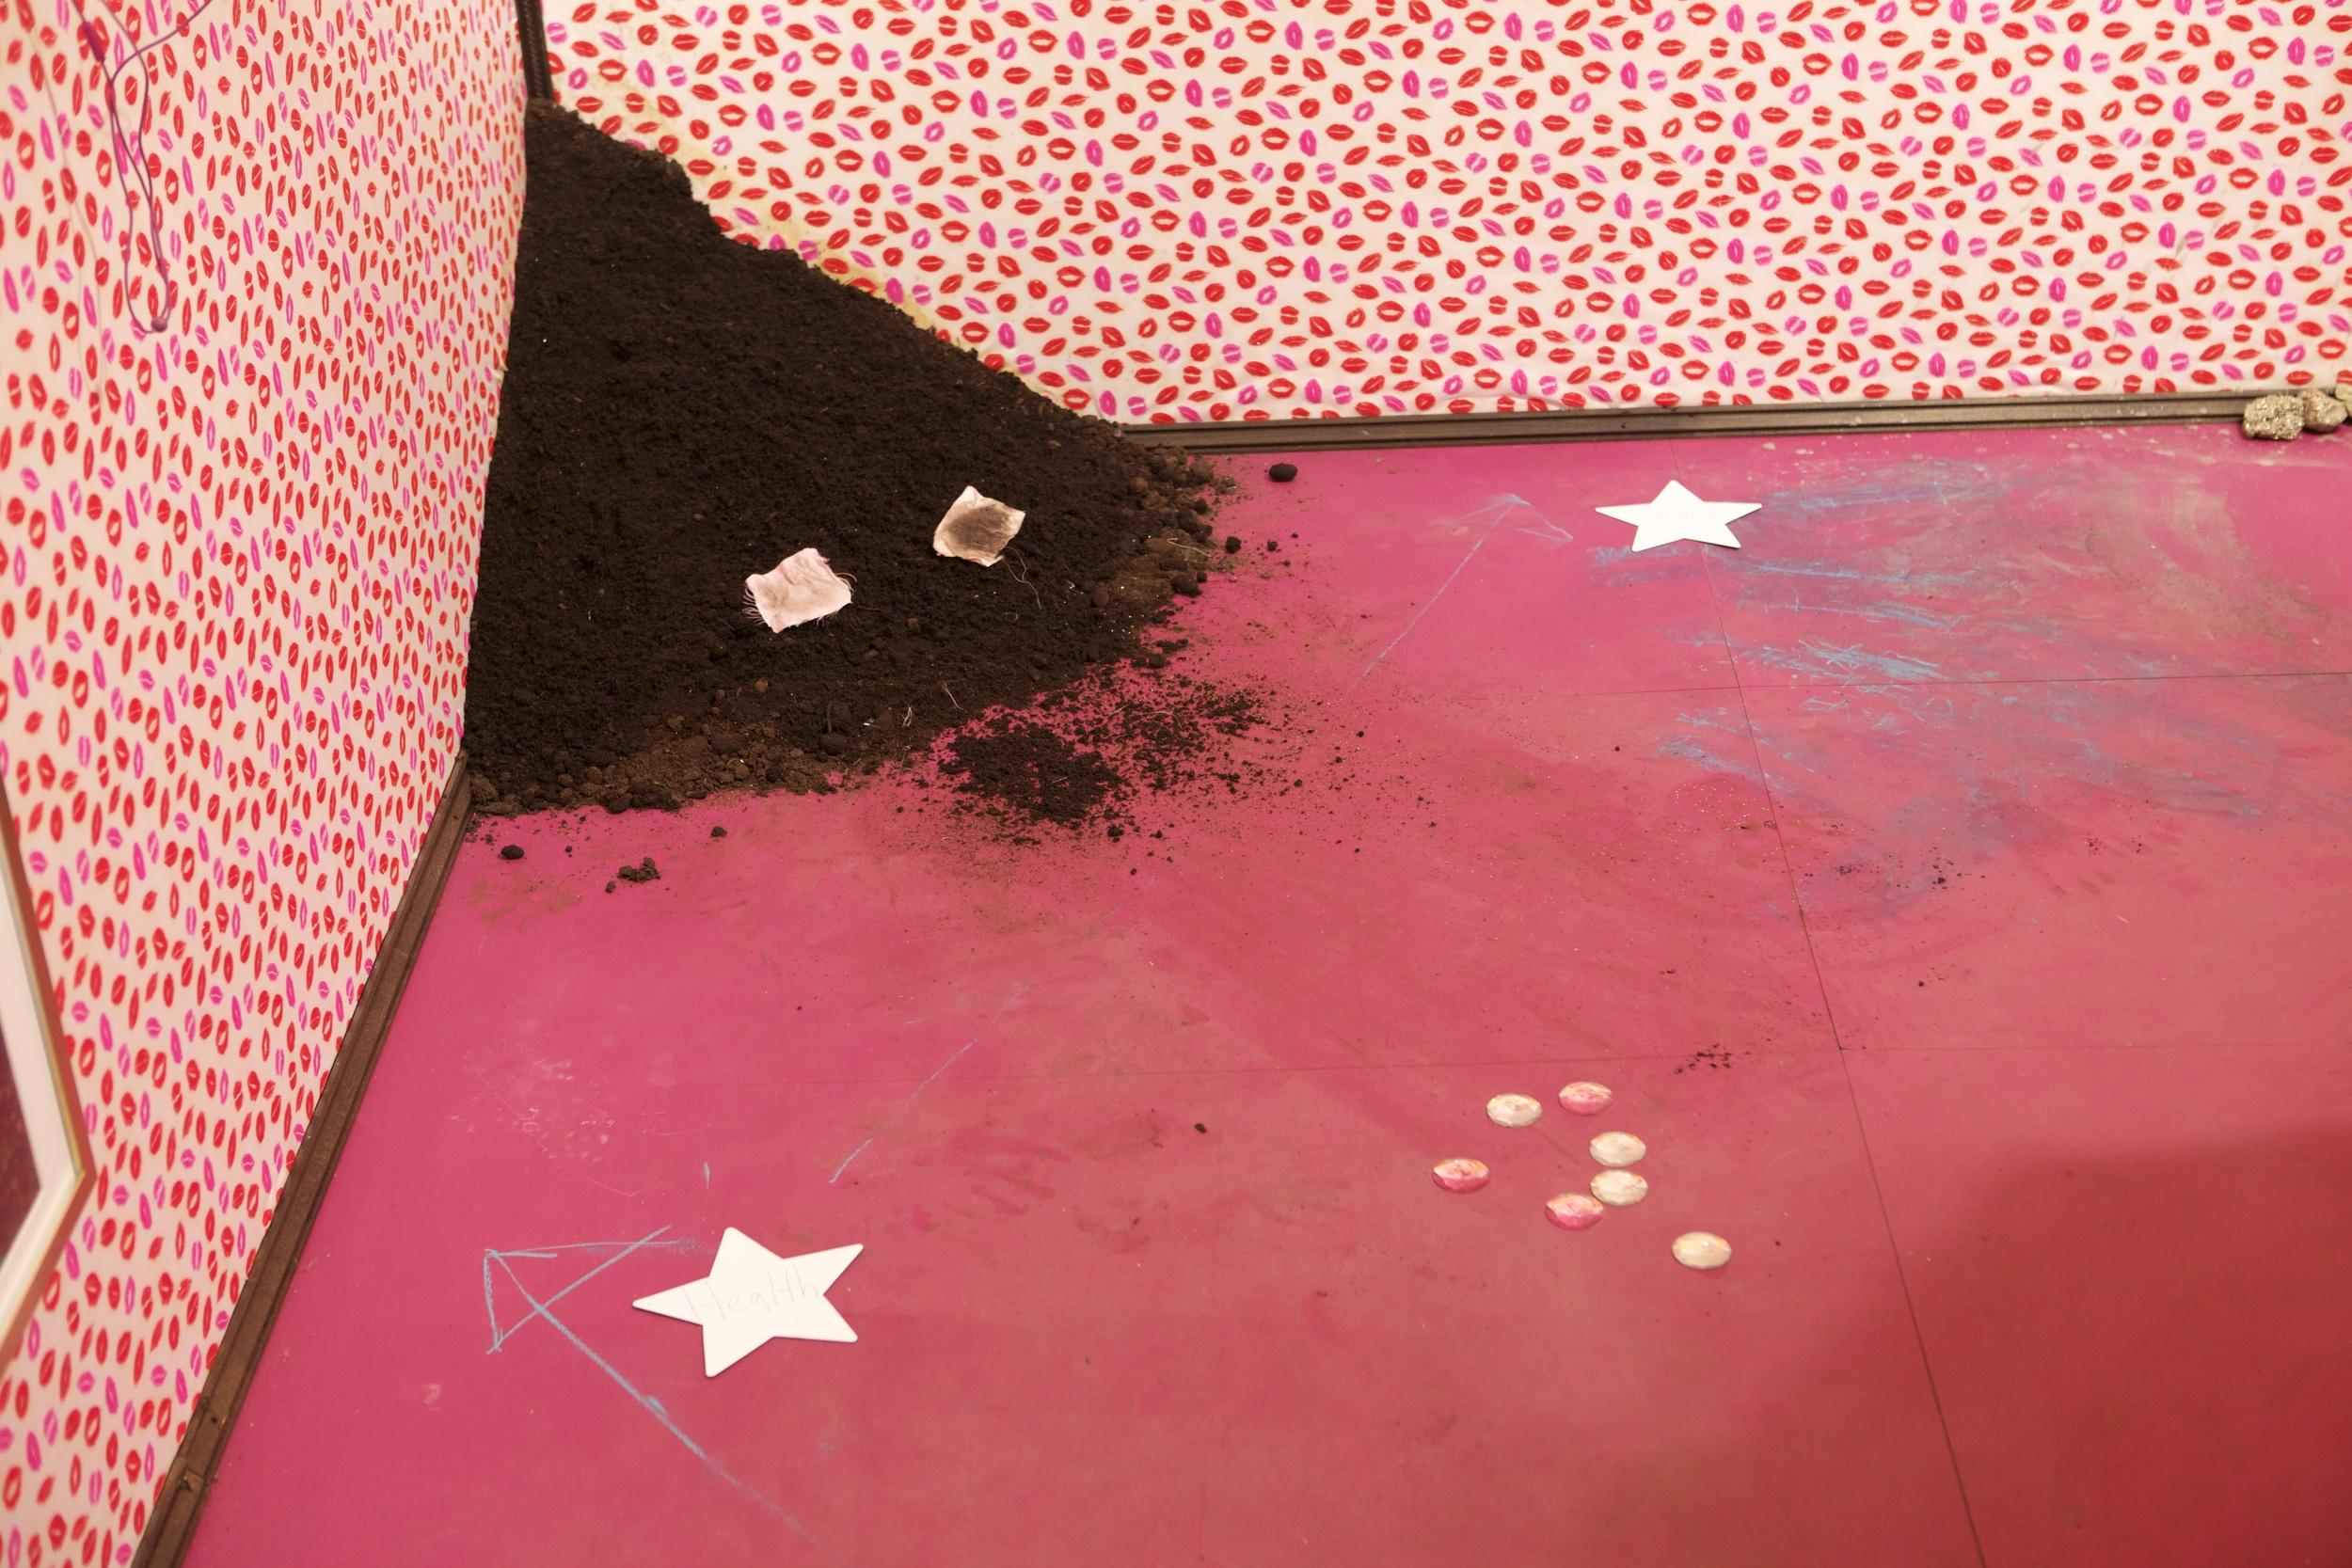 sparkle-seedbed-post-performance.jpg